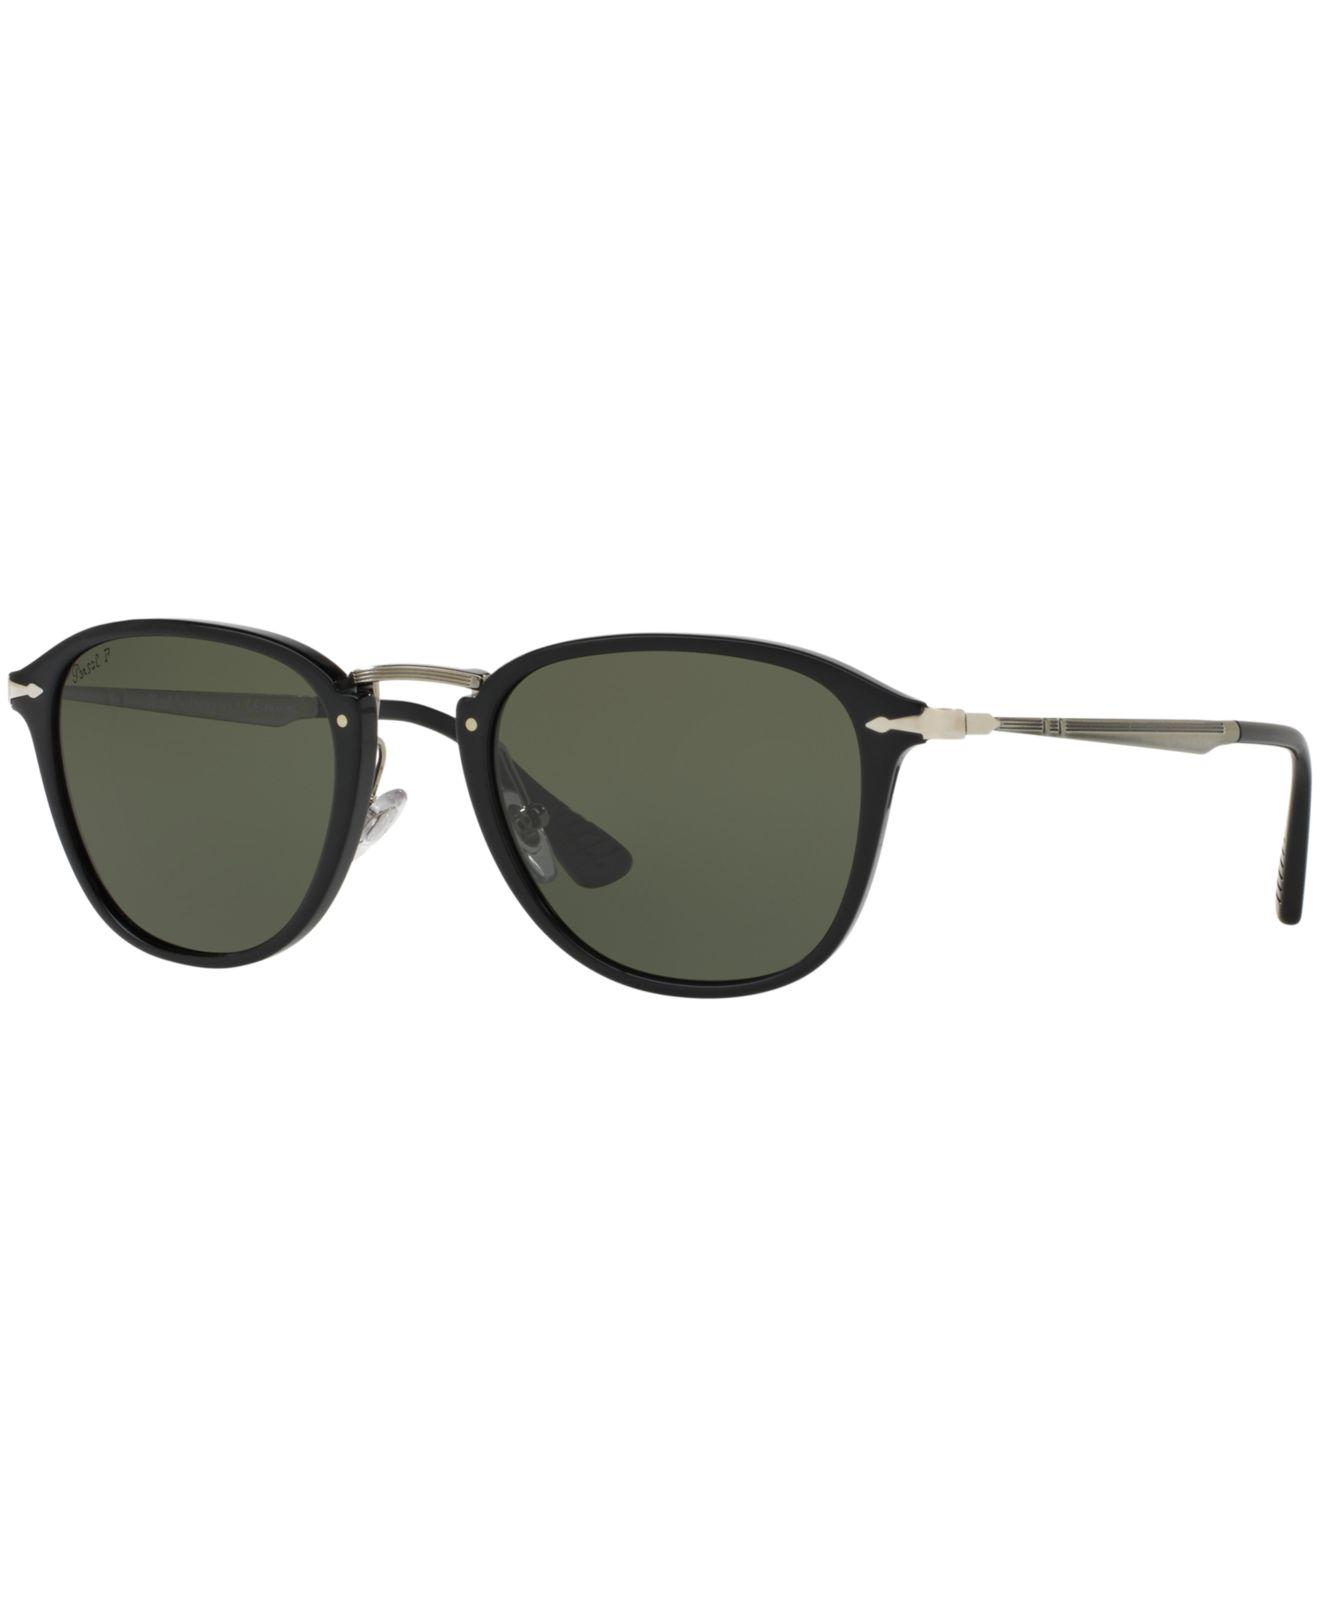 52c5c7b442 Lyst - Persol Sunglasses